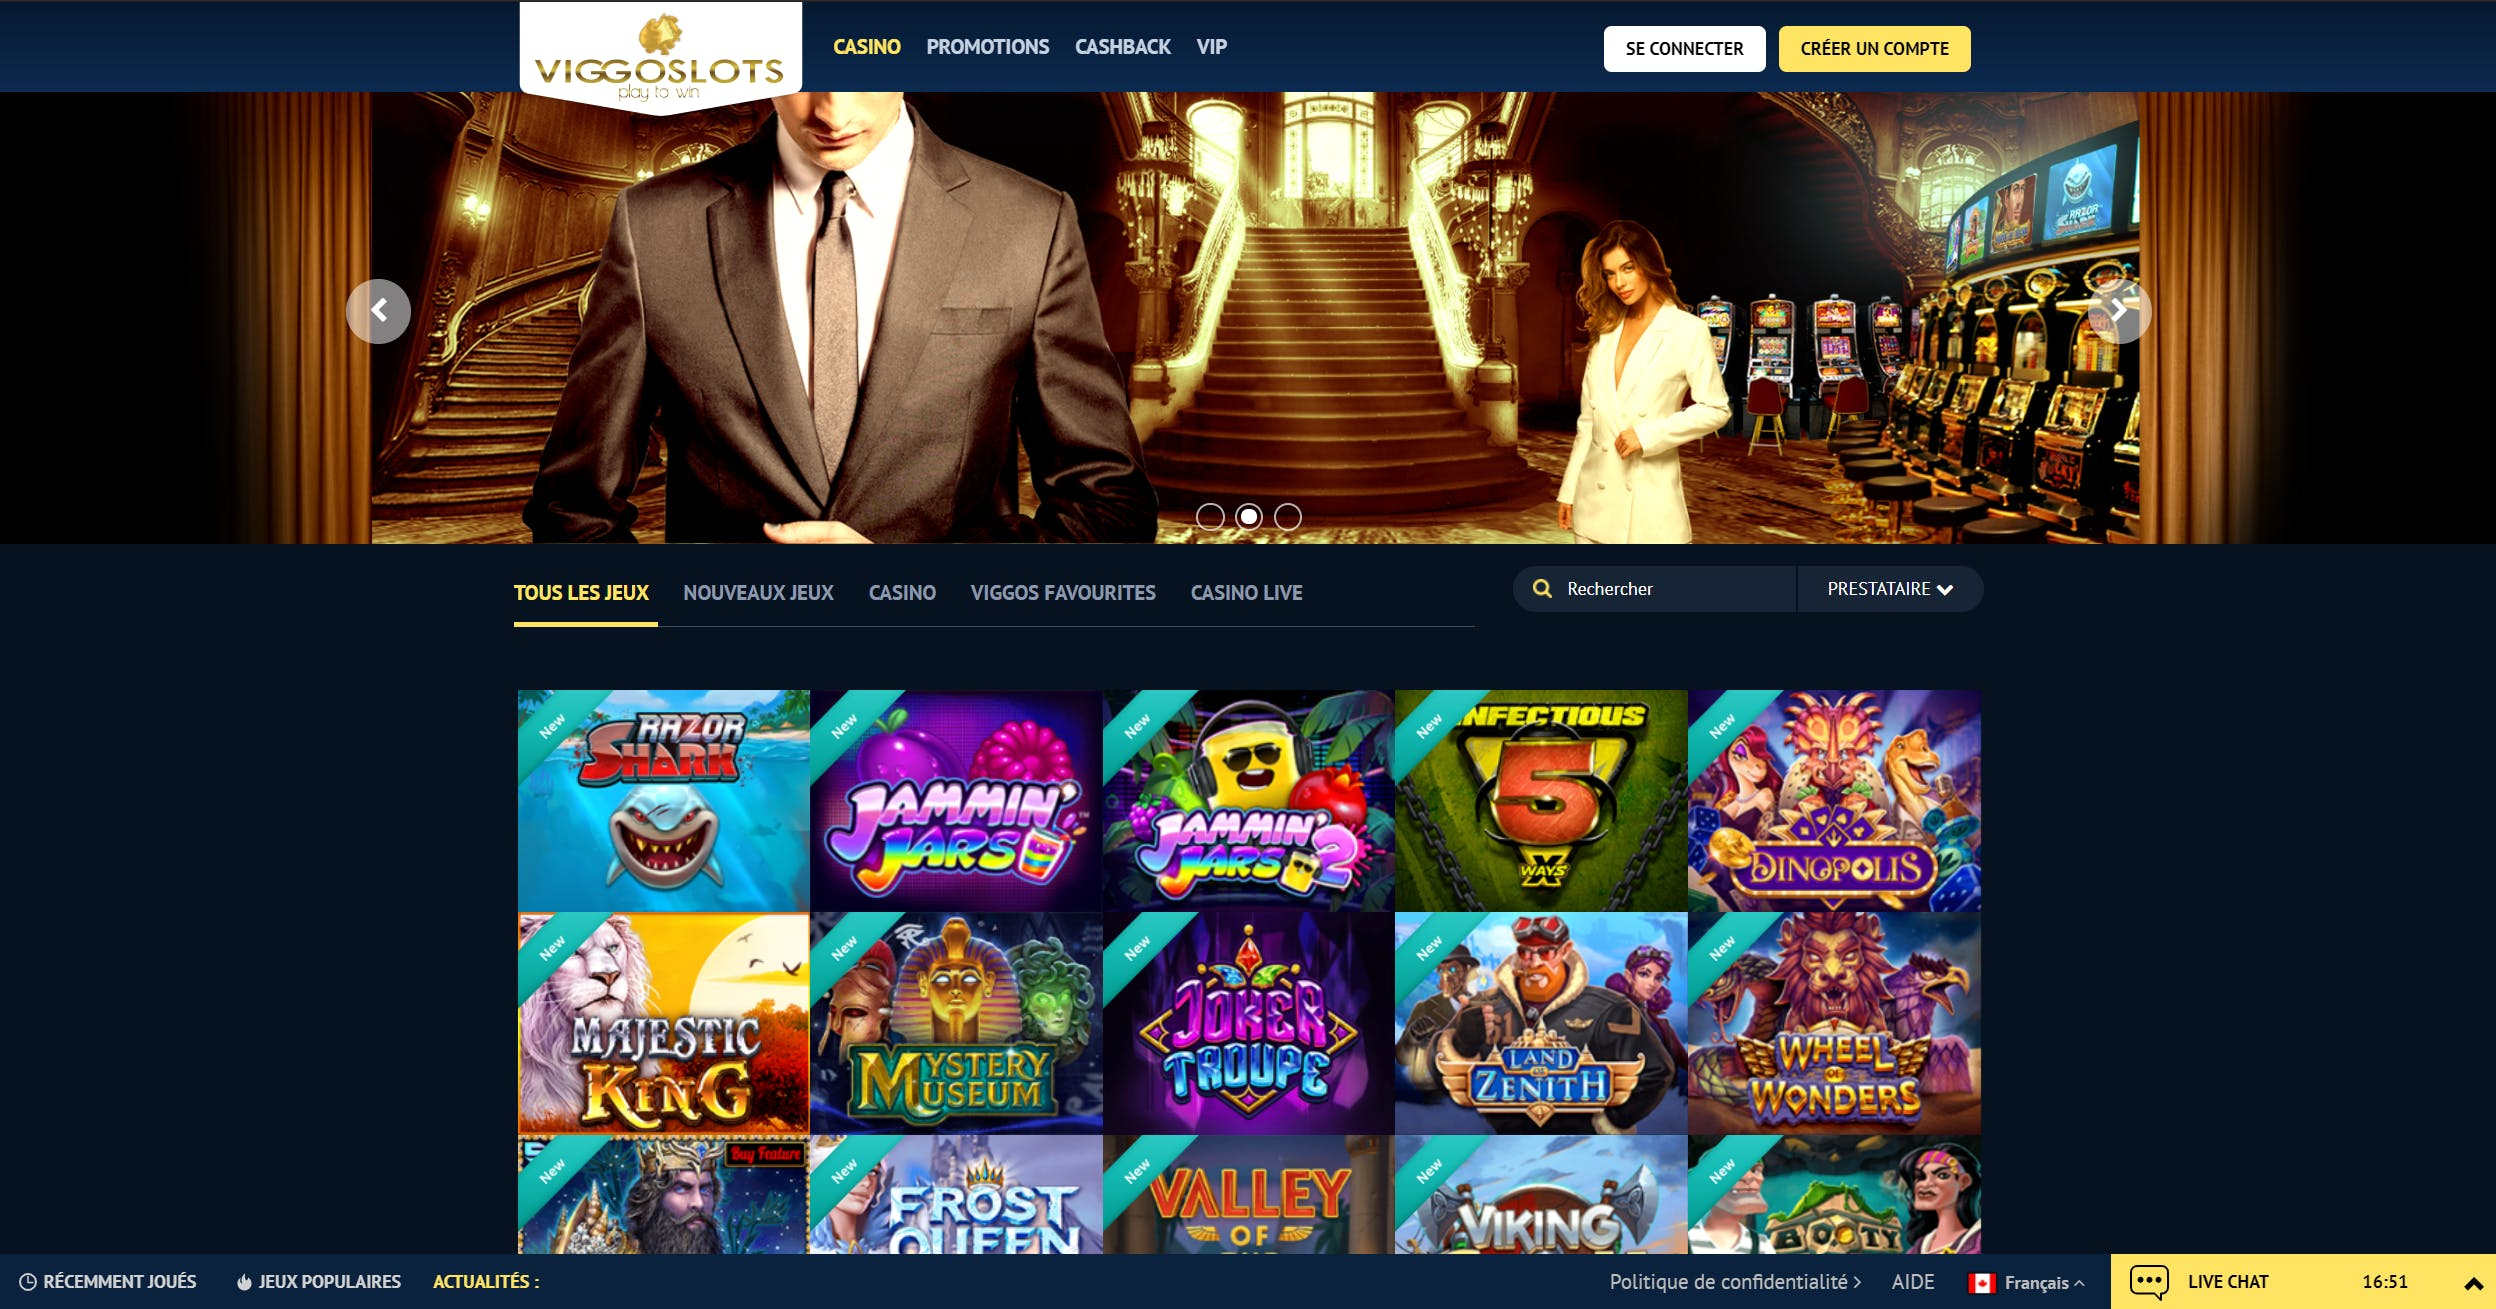 Landing page du casino en ligne viggoslots